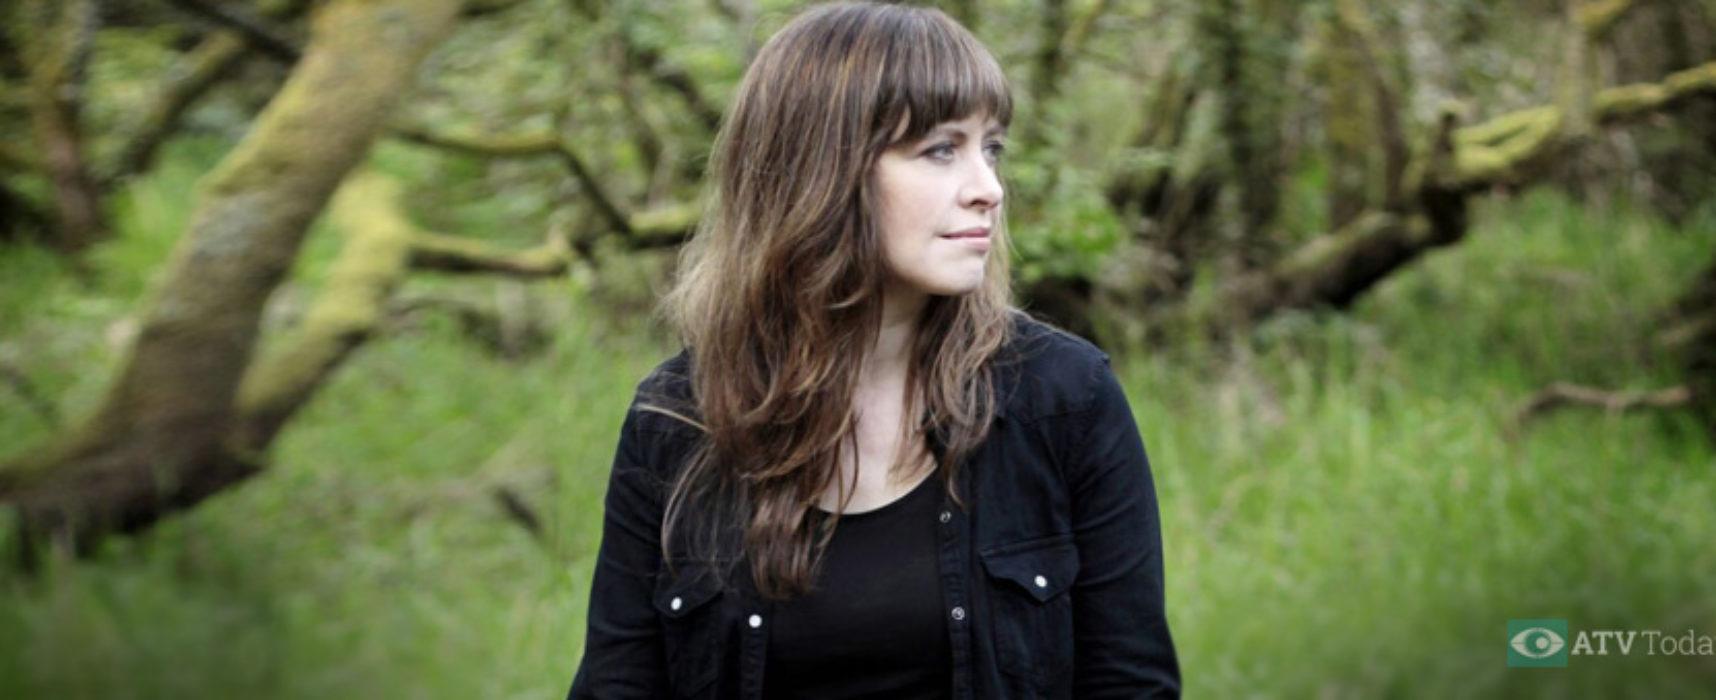 Sarah McQuaid Spring Tour UK dates